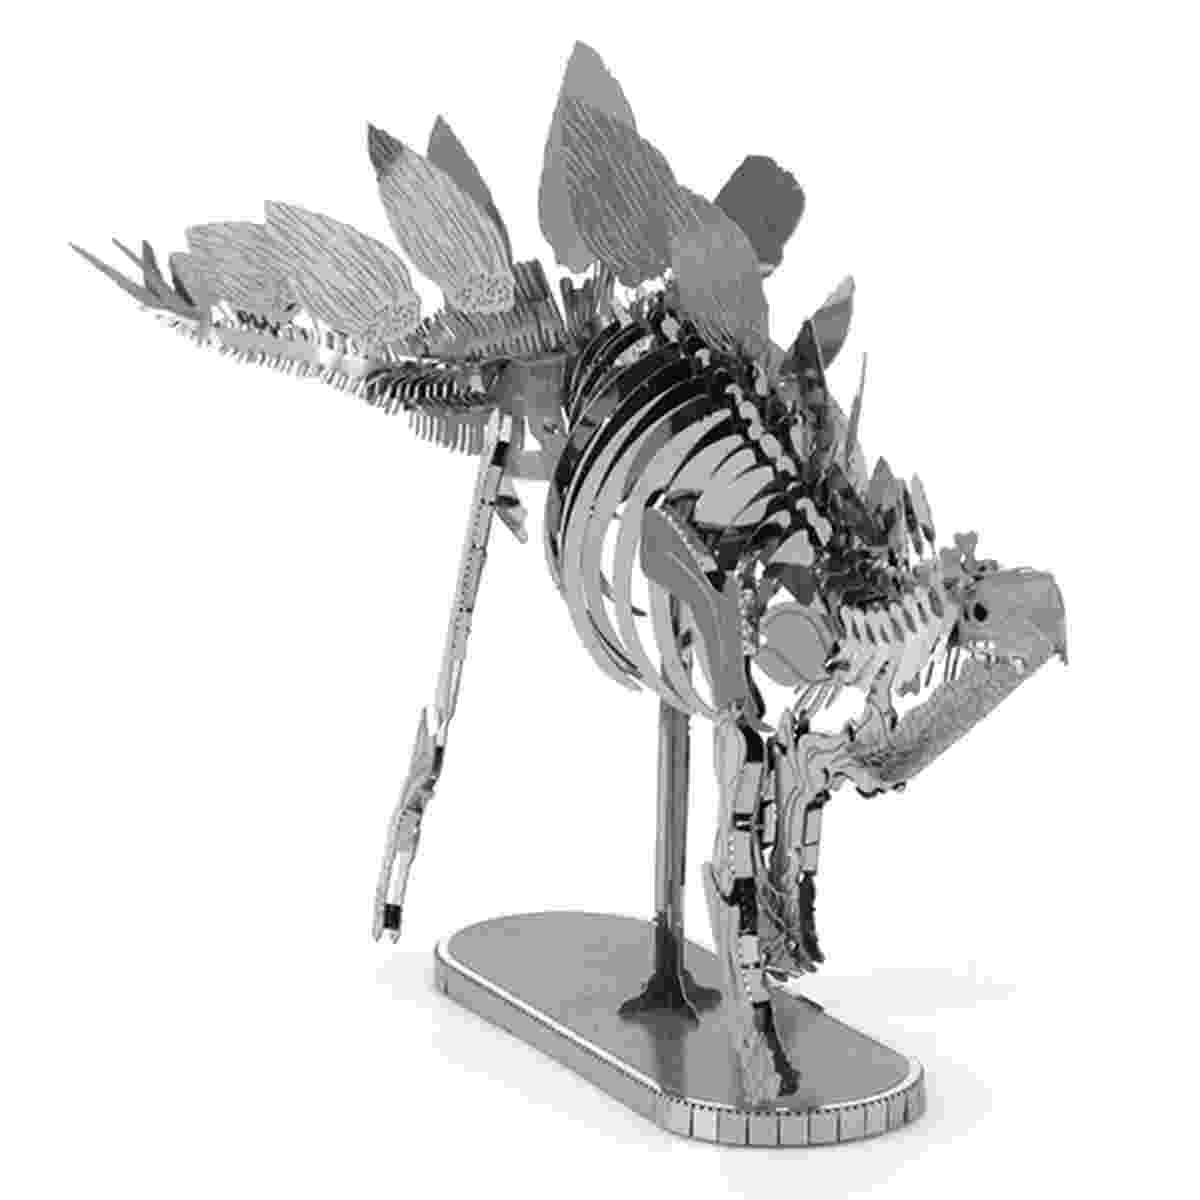 picture of a stegosaurus stegosaurus coloring page birthday a stegosaurus picture of